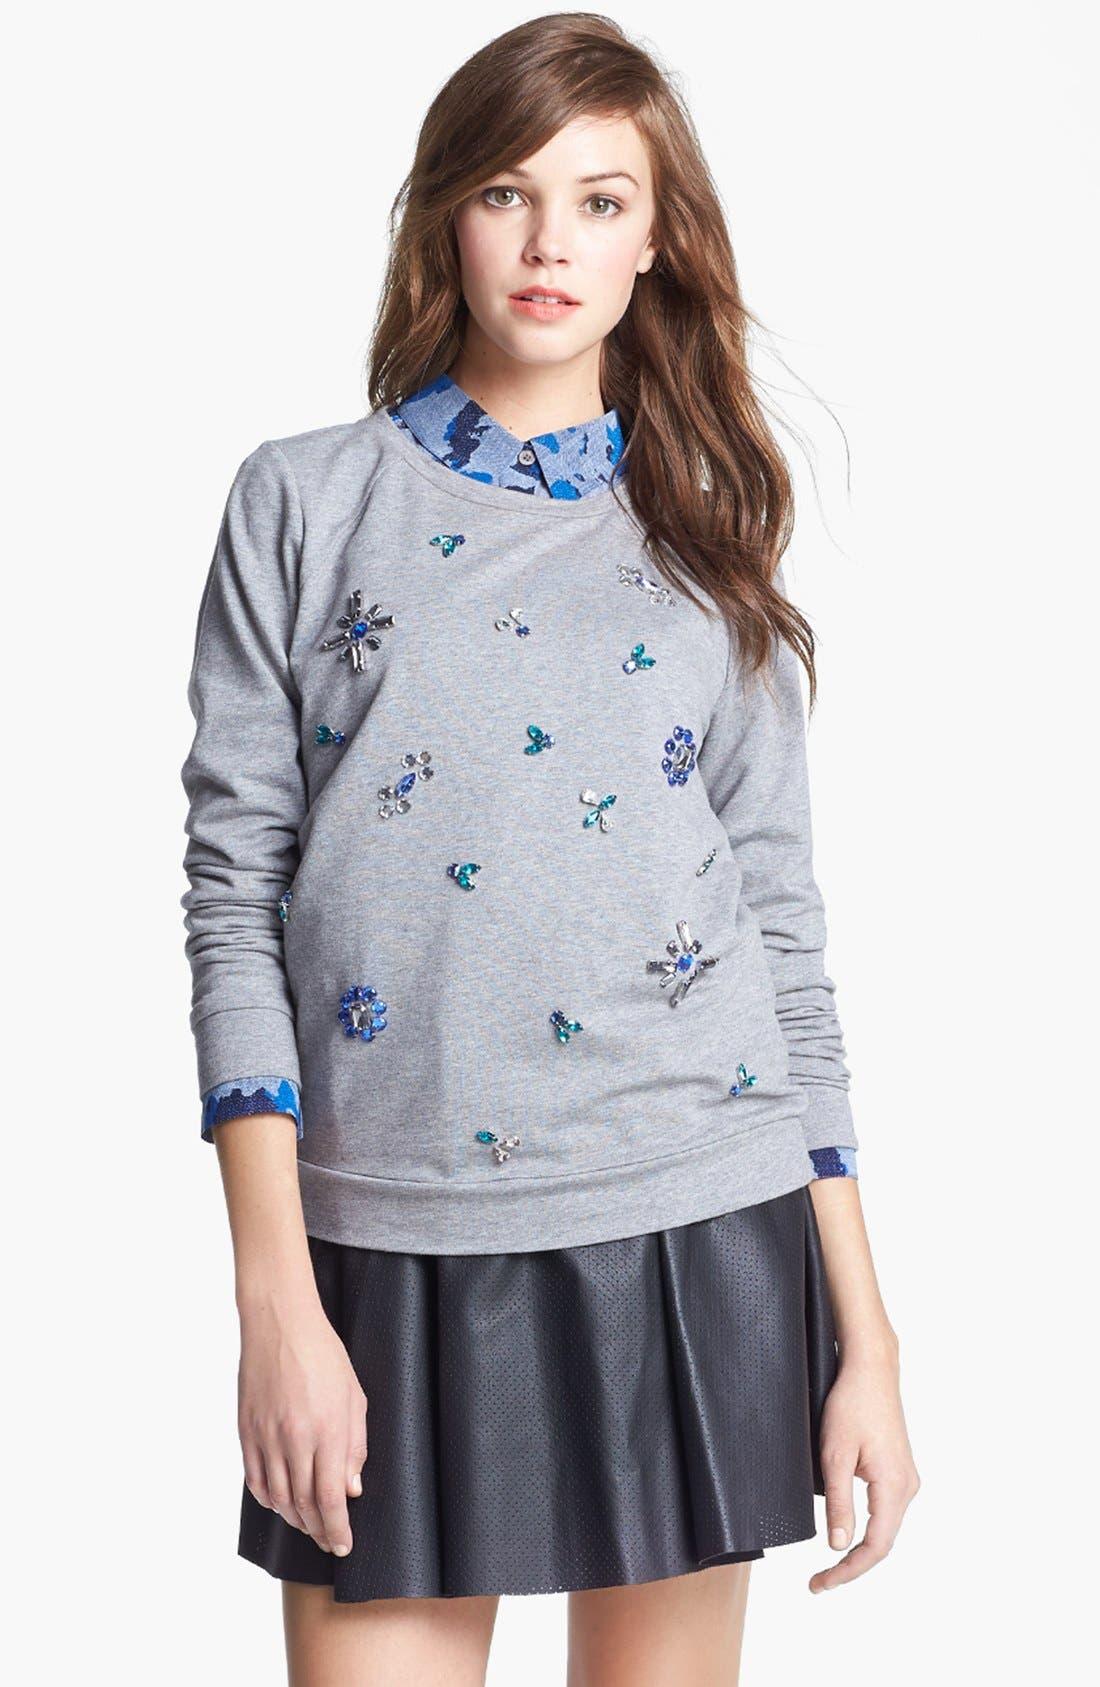 Main Image - Two by Vince Camuto Jeweled Baseball Sweatshirt (Petite)